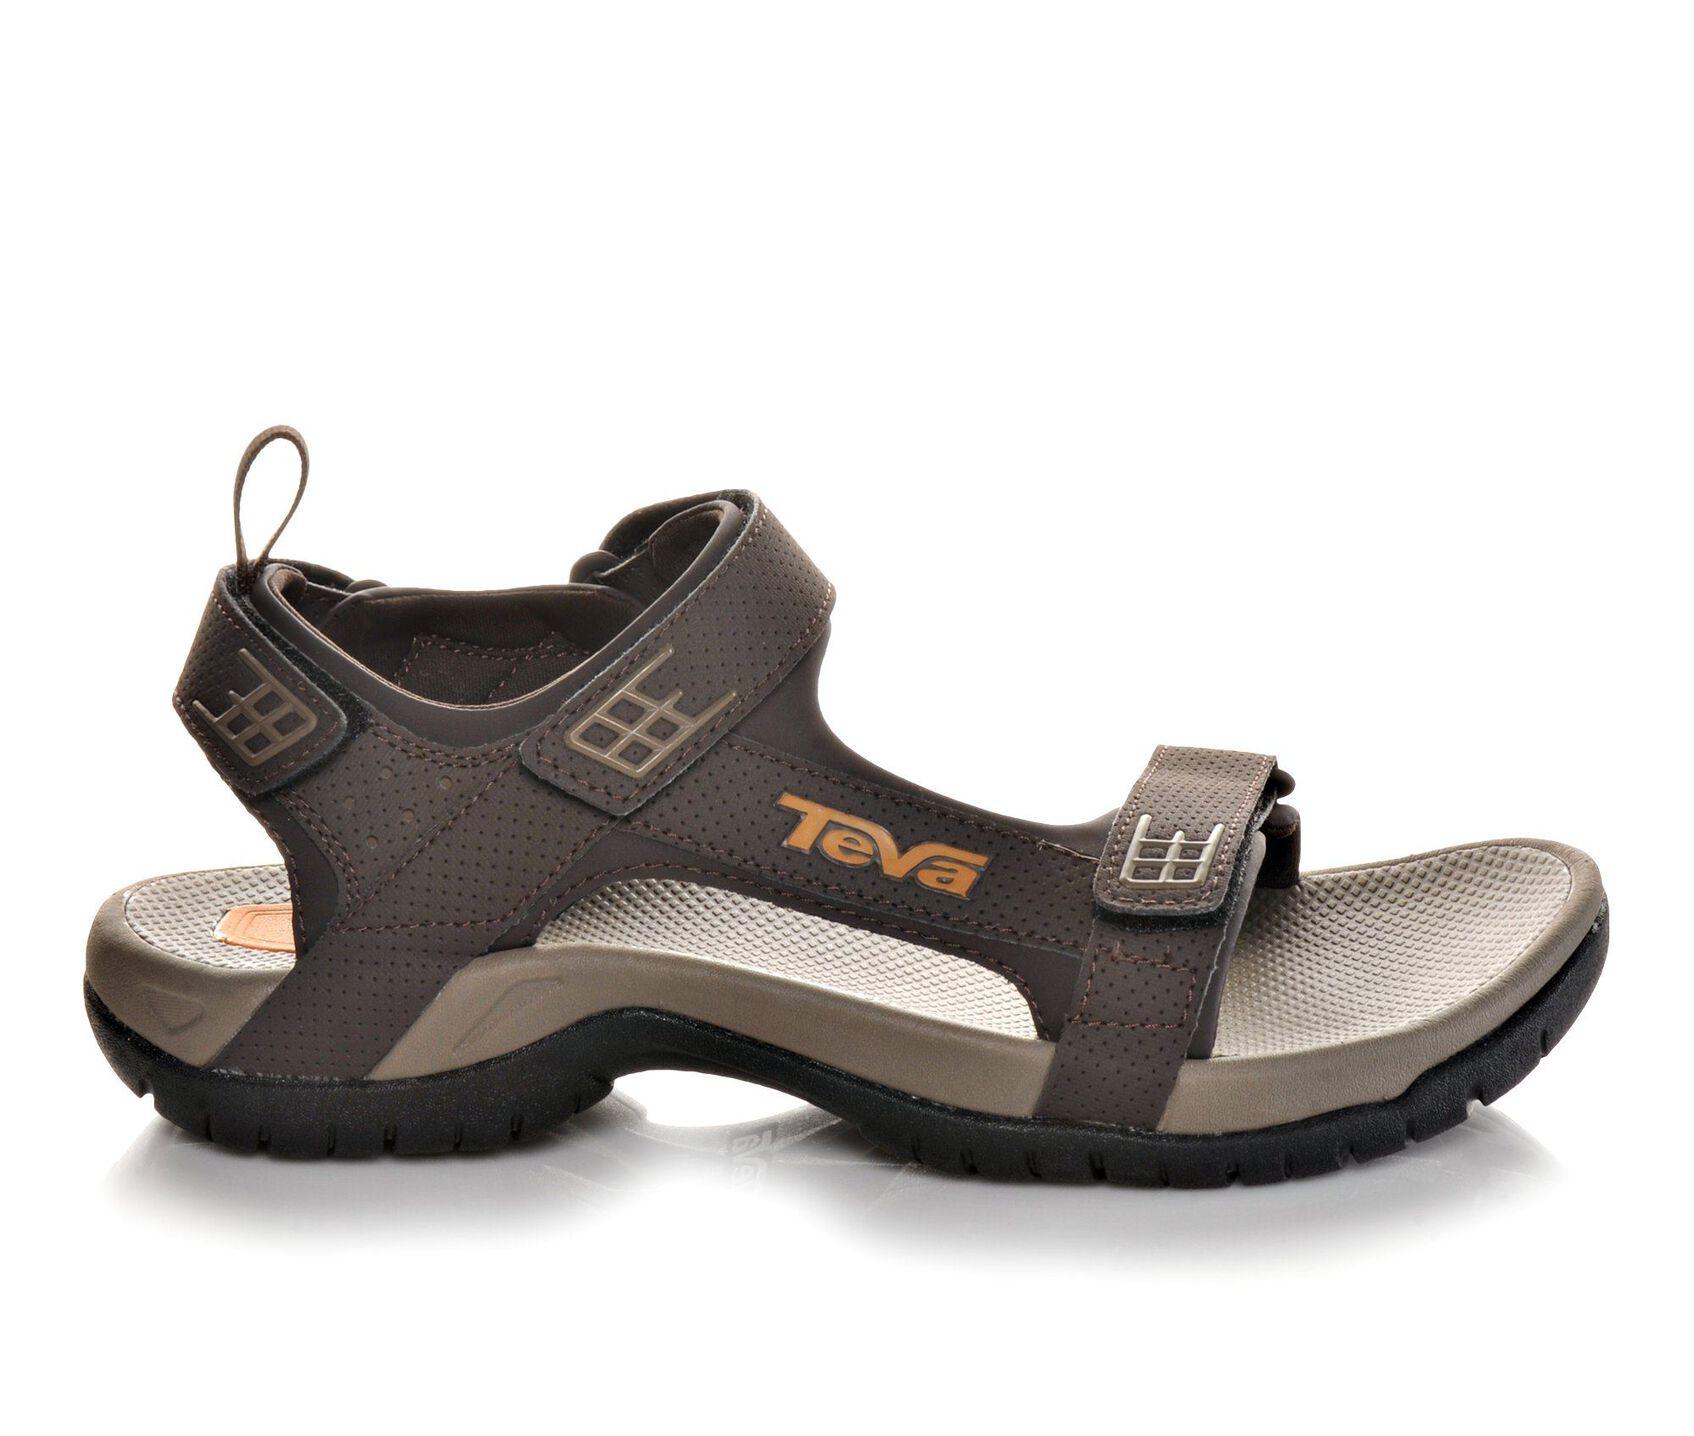 a865498aada Men s Teva Minam Hiking Sandals